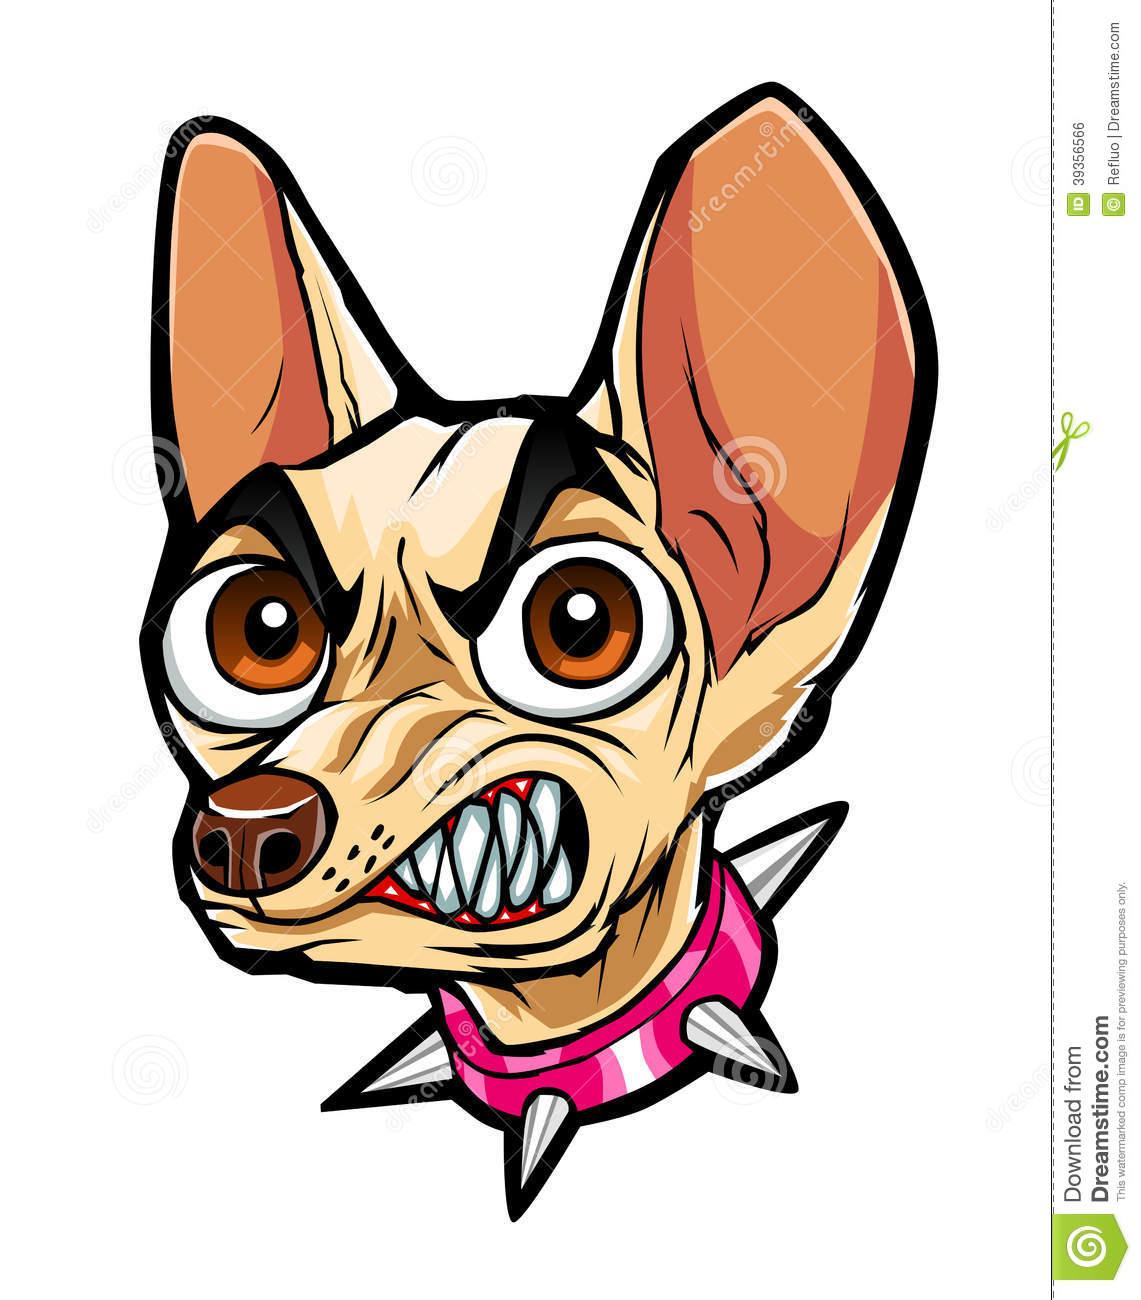 Mean face . Chihuahua clipart chihuahua puppy